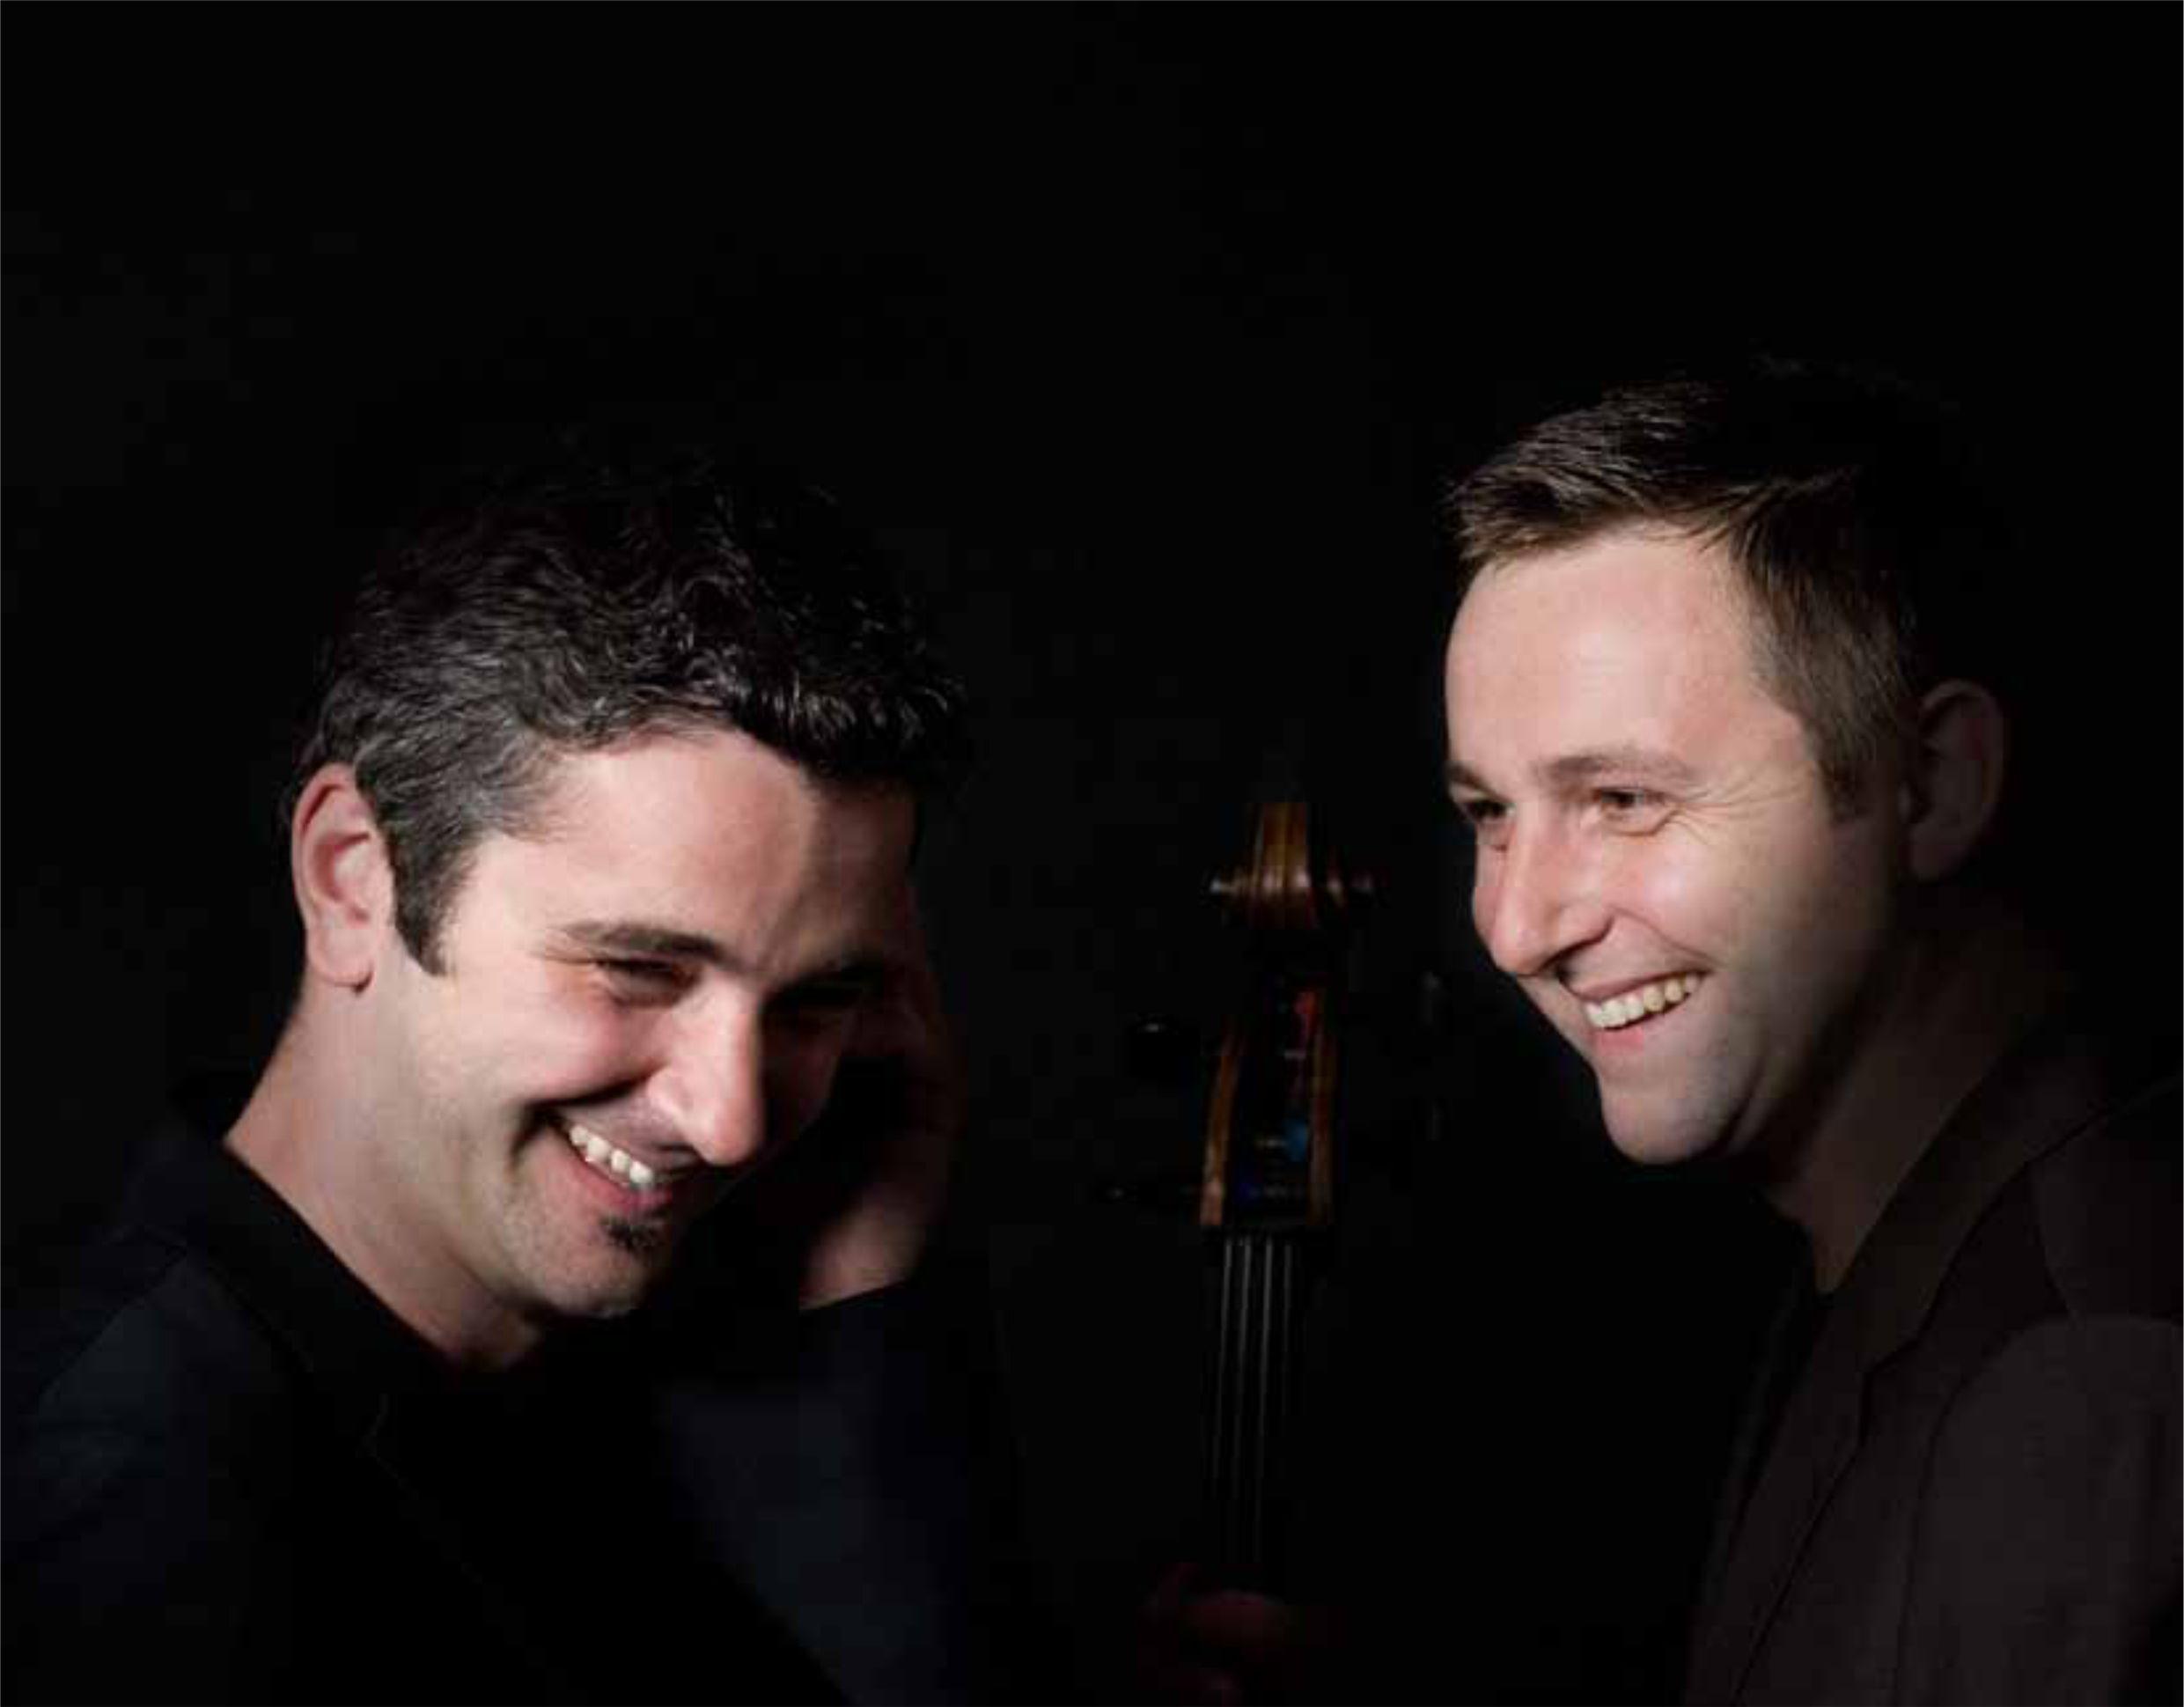 Jamie Walton and Daniel Grimwood